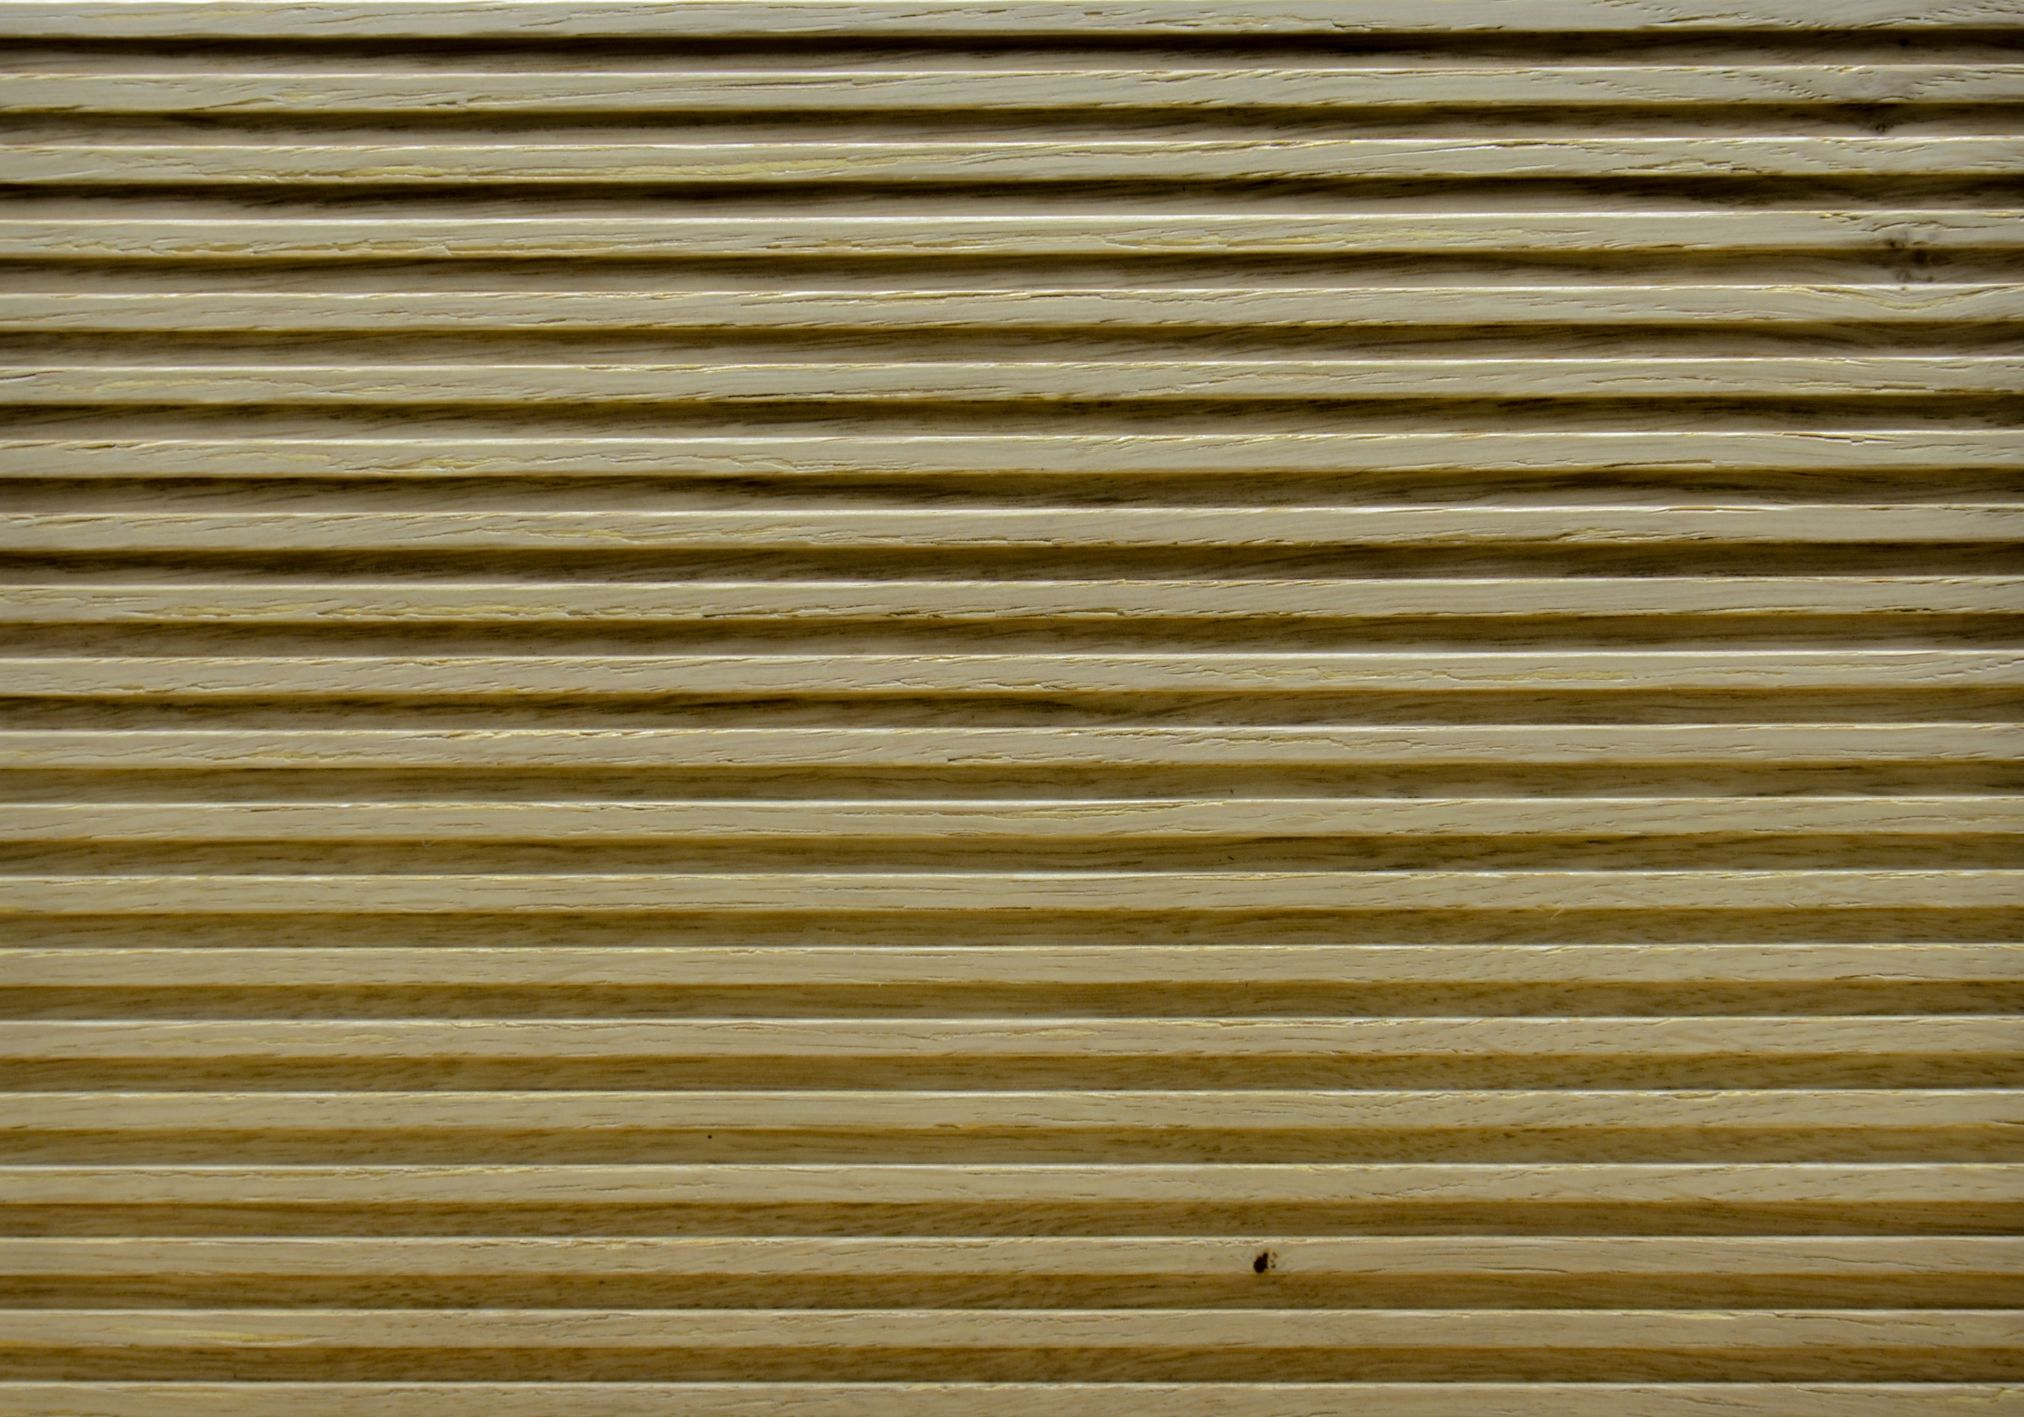 2609 - BAR - Knob Oak - Real wood veneer